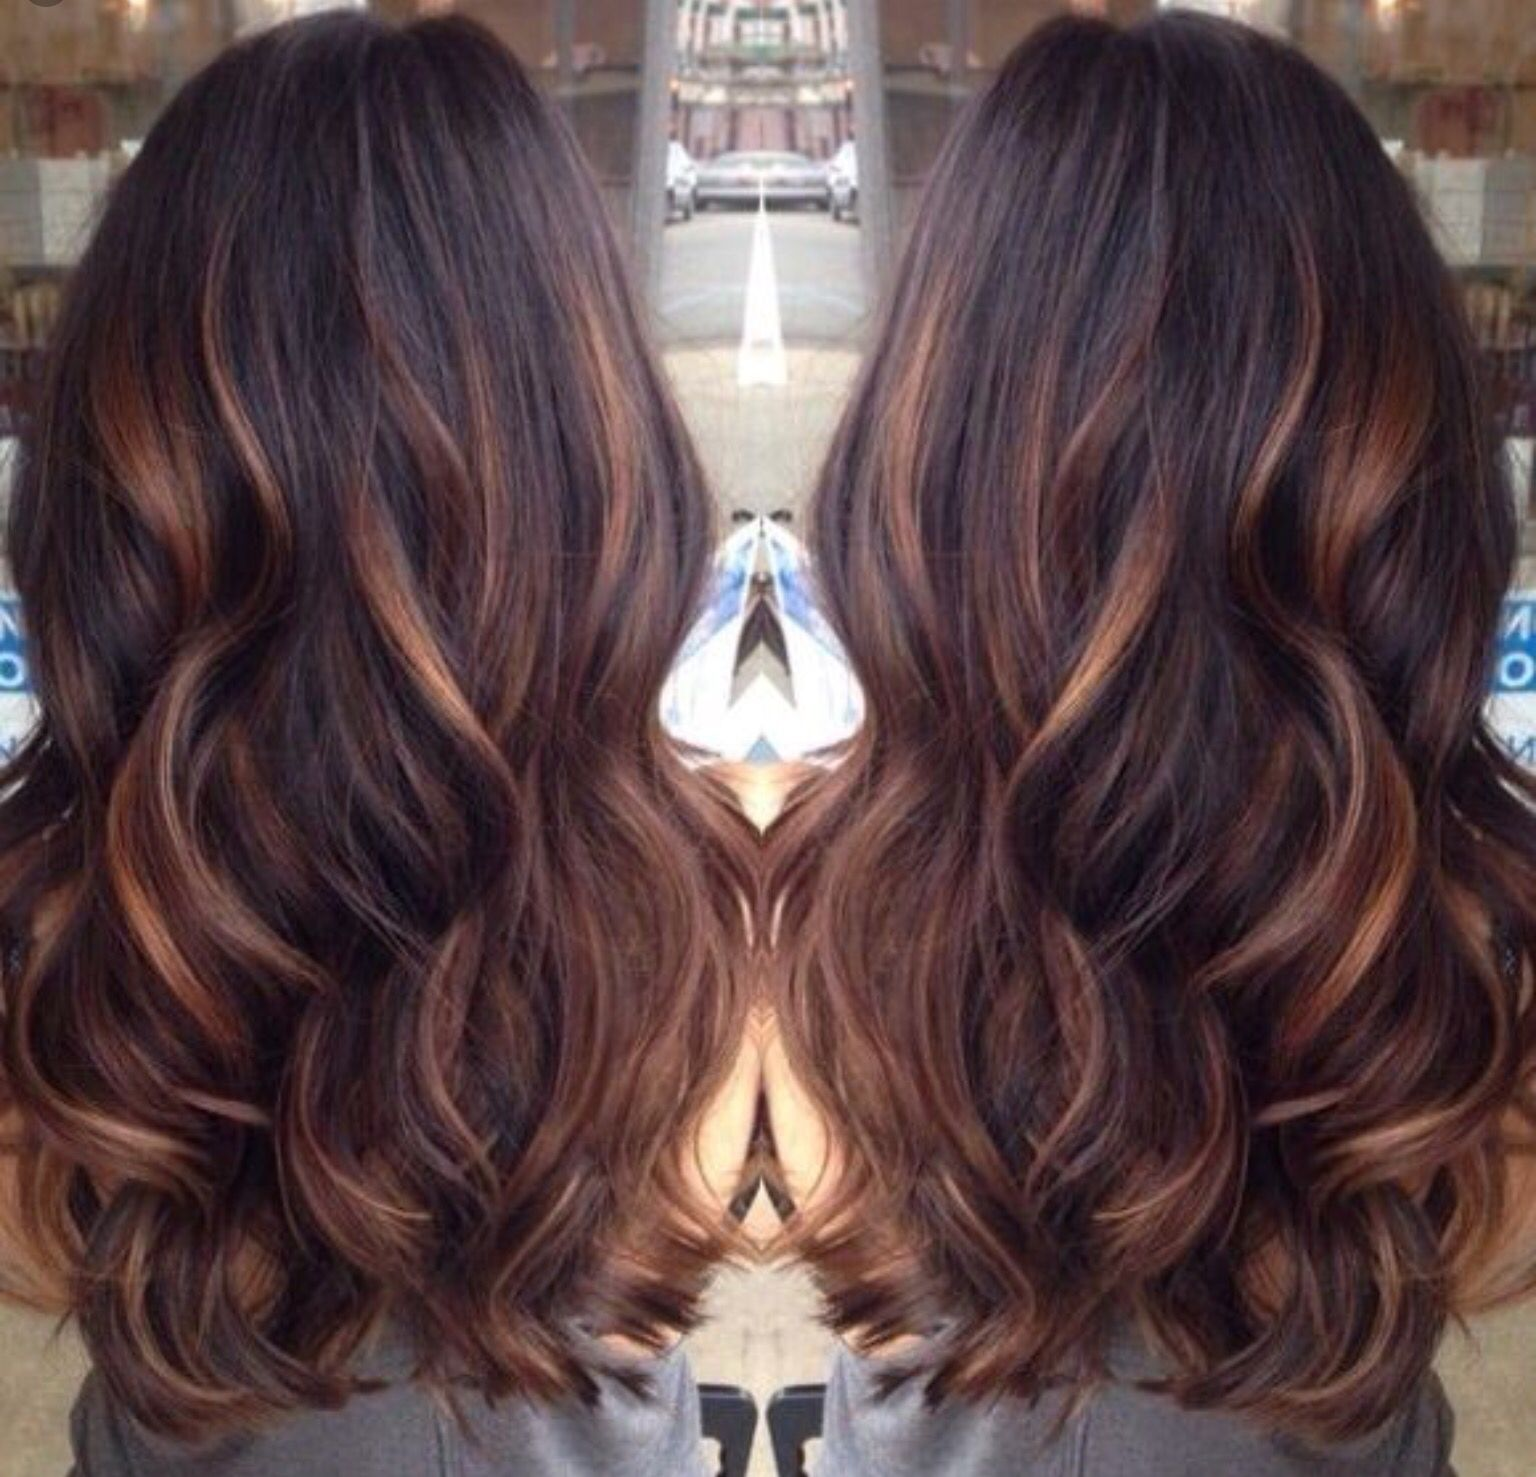 Dark Brown Hair With Caramel Lowlights Hair Styles Long Hair Styles Cool Hair Color